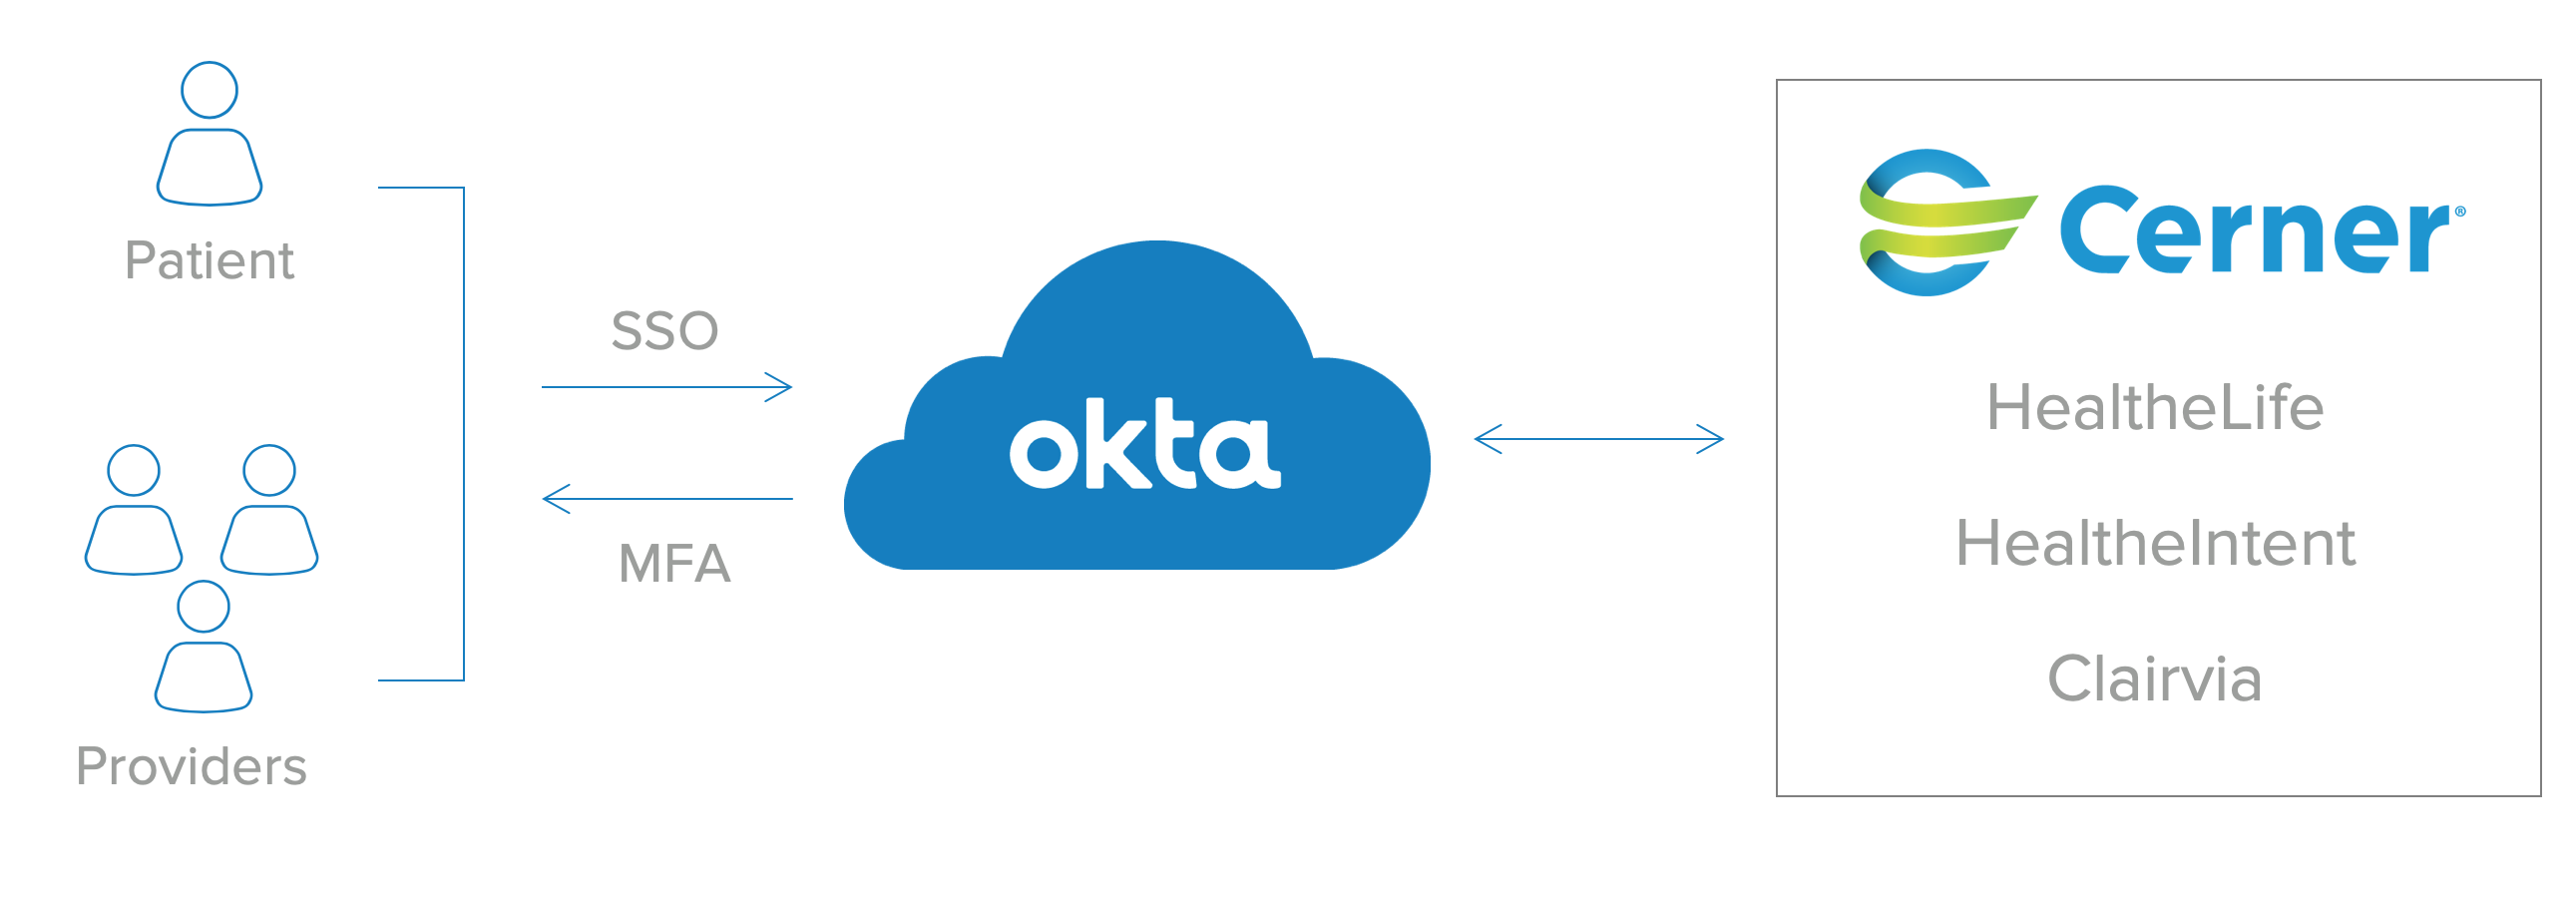 Okta and Cerner dramatically improves hospital management and workflows.